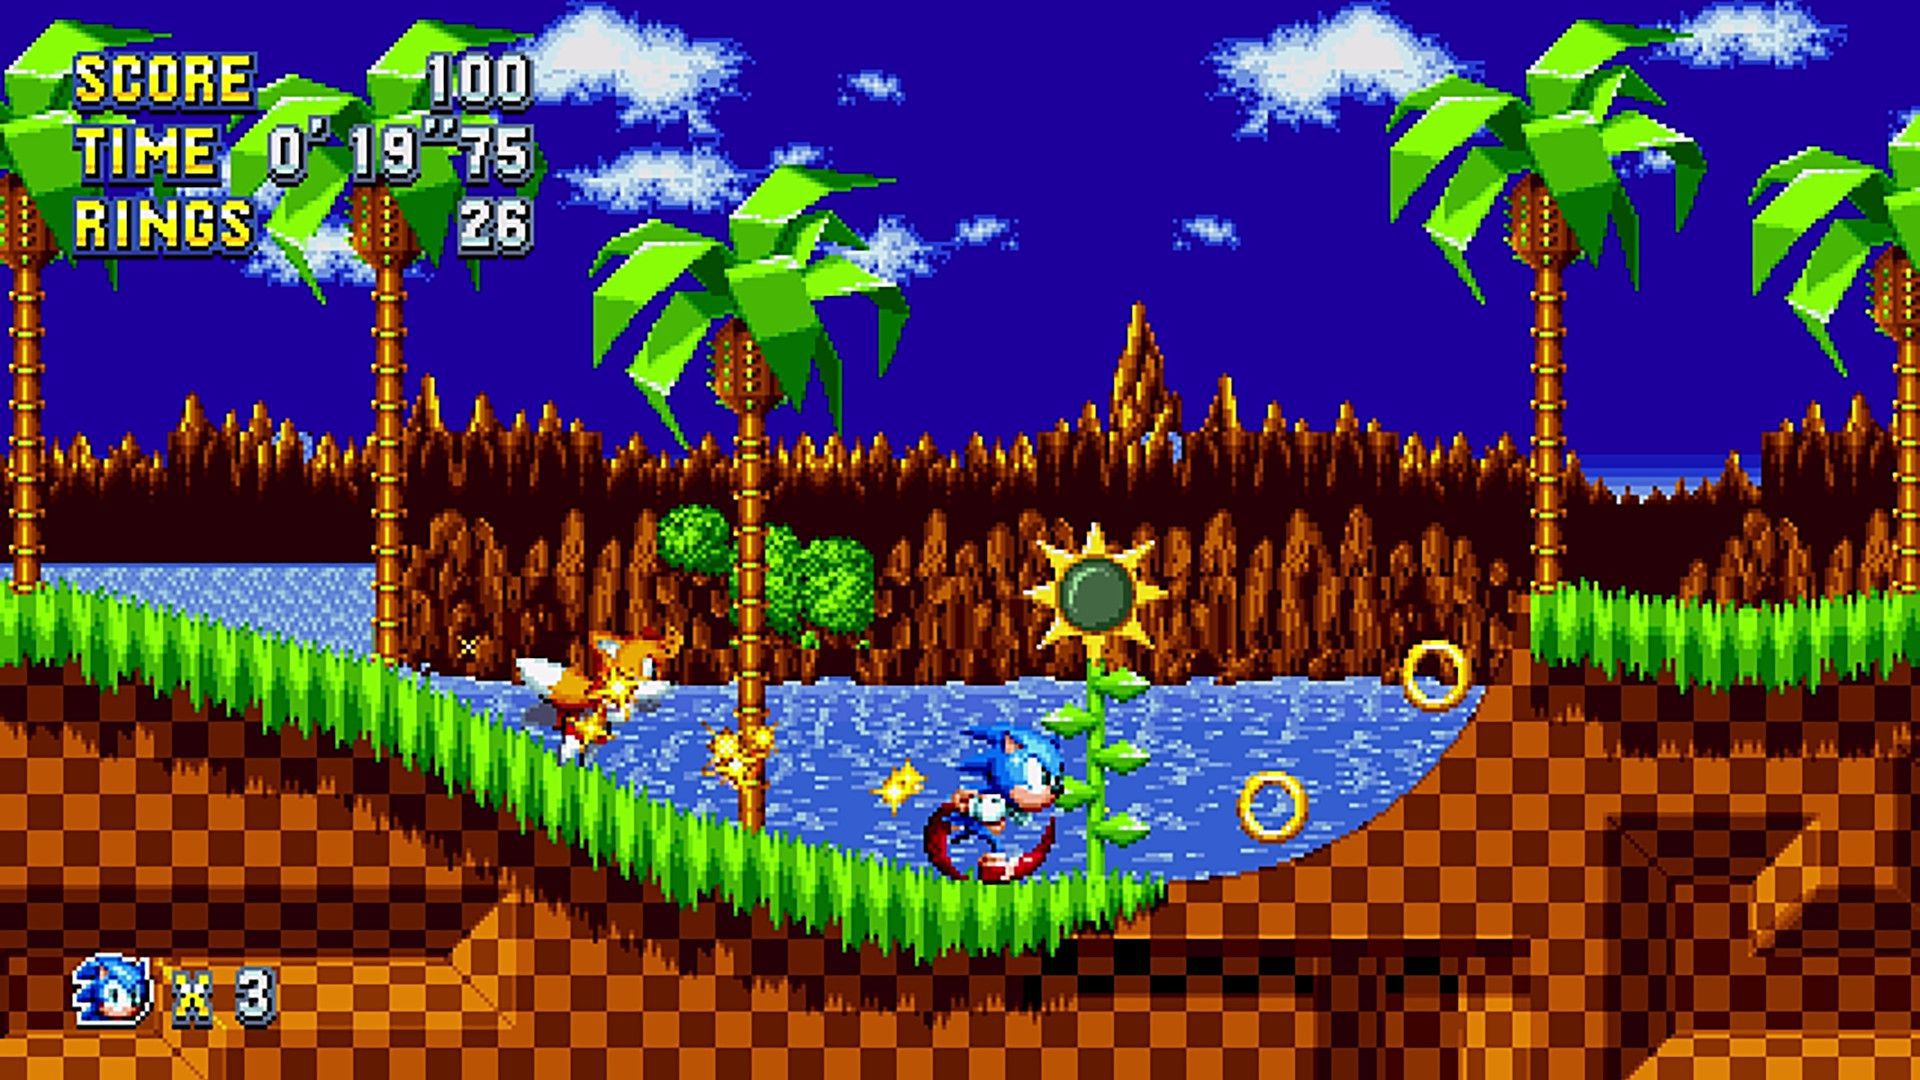 Review: Sonic Mania - Slant Magazine